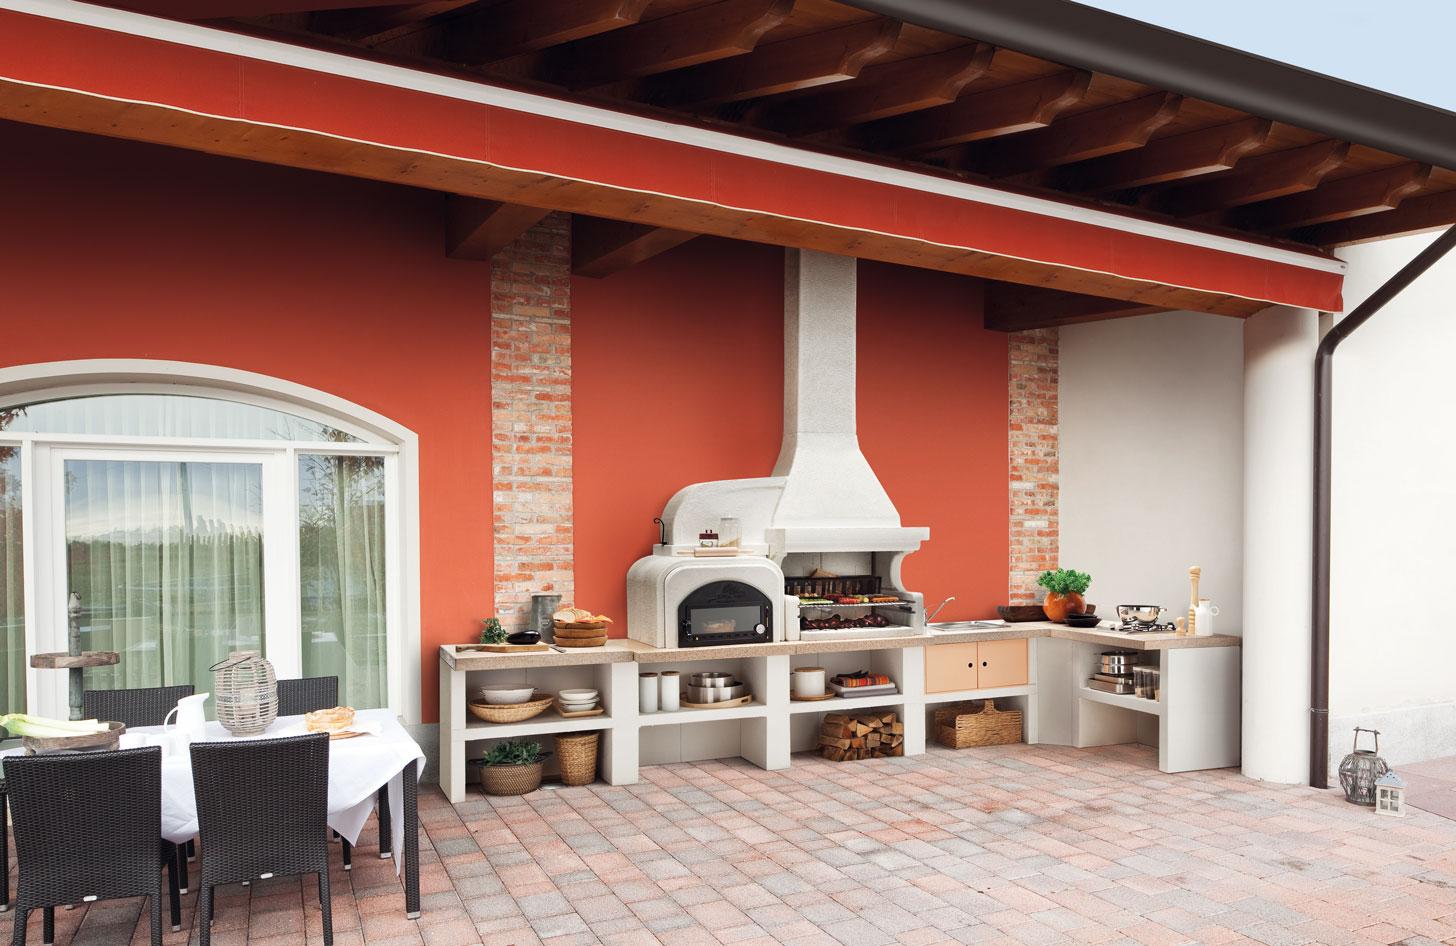 Cucine da esterno piani cottura barbecue e arredi per for Cucine in muratura fai da te